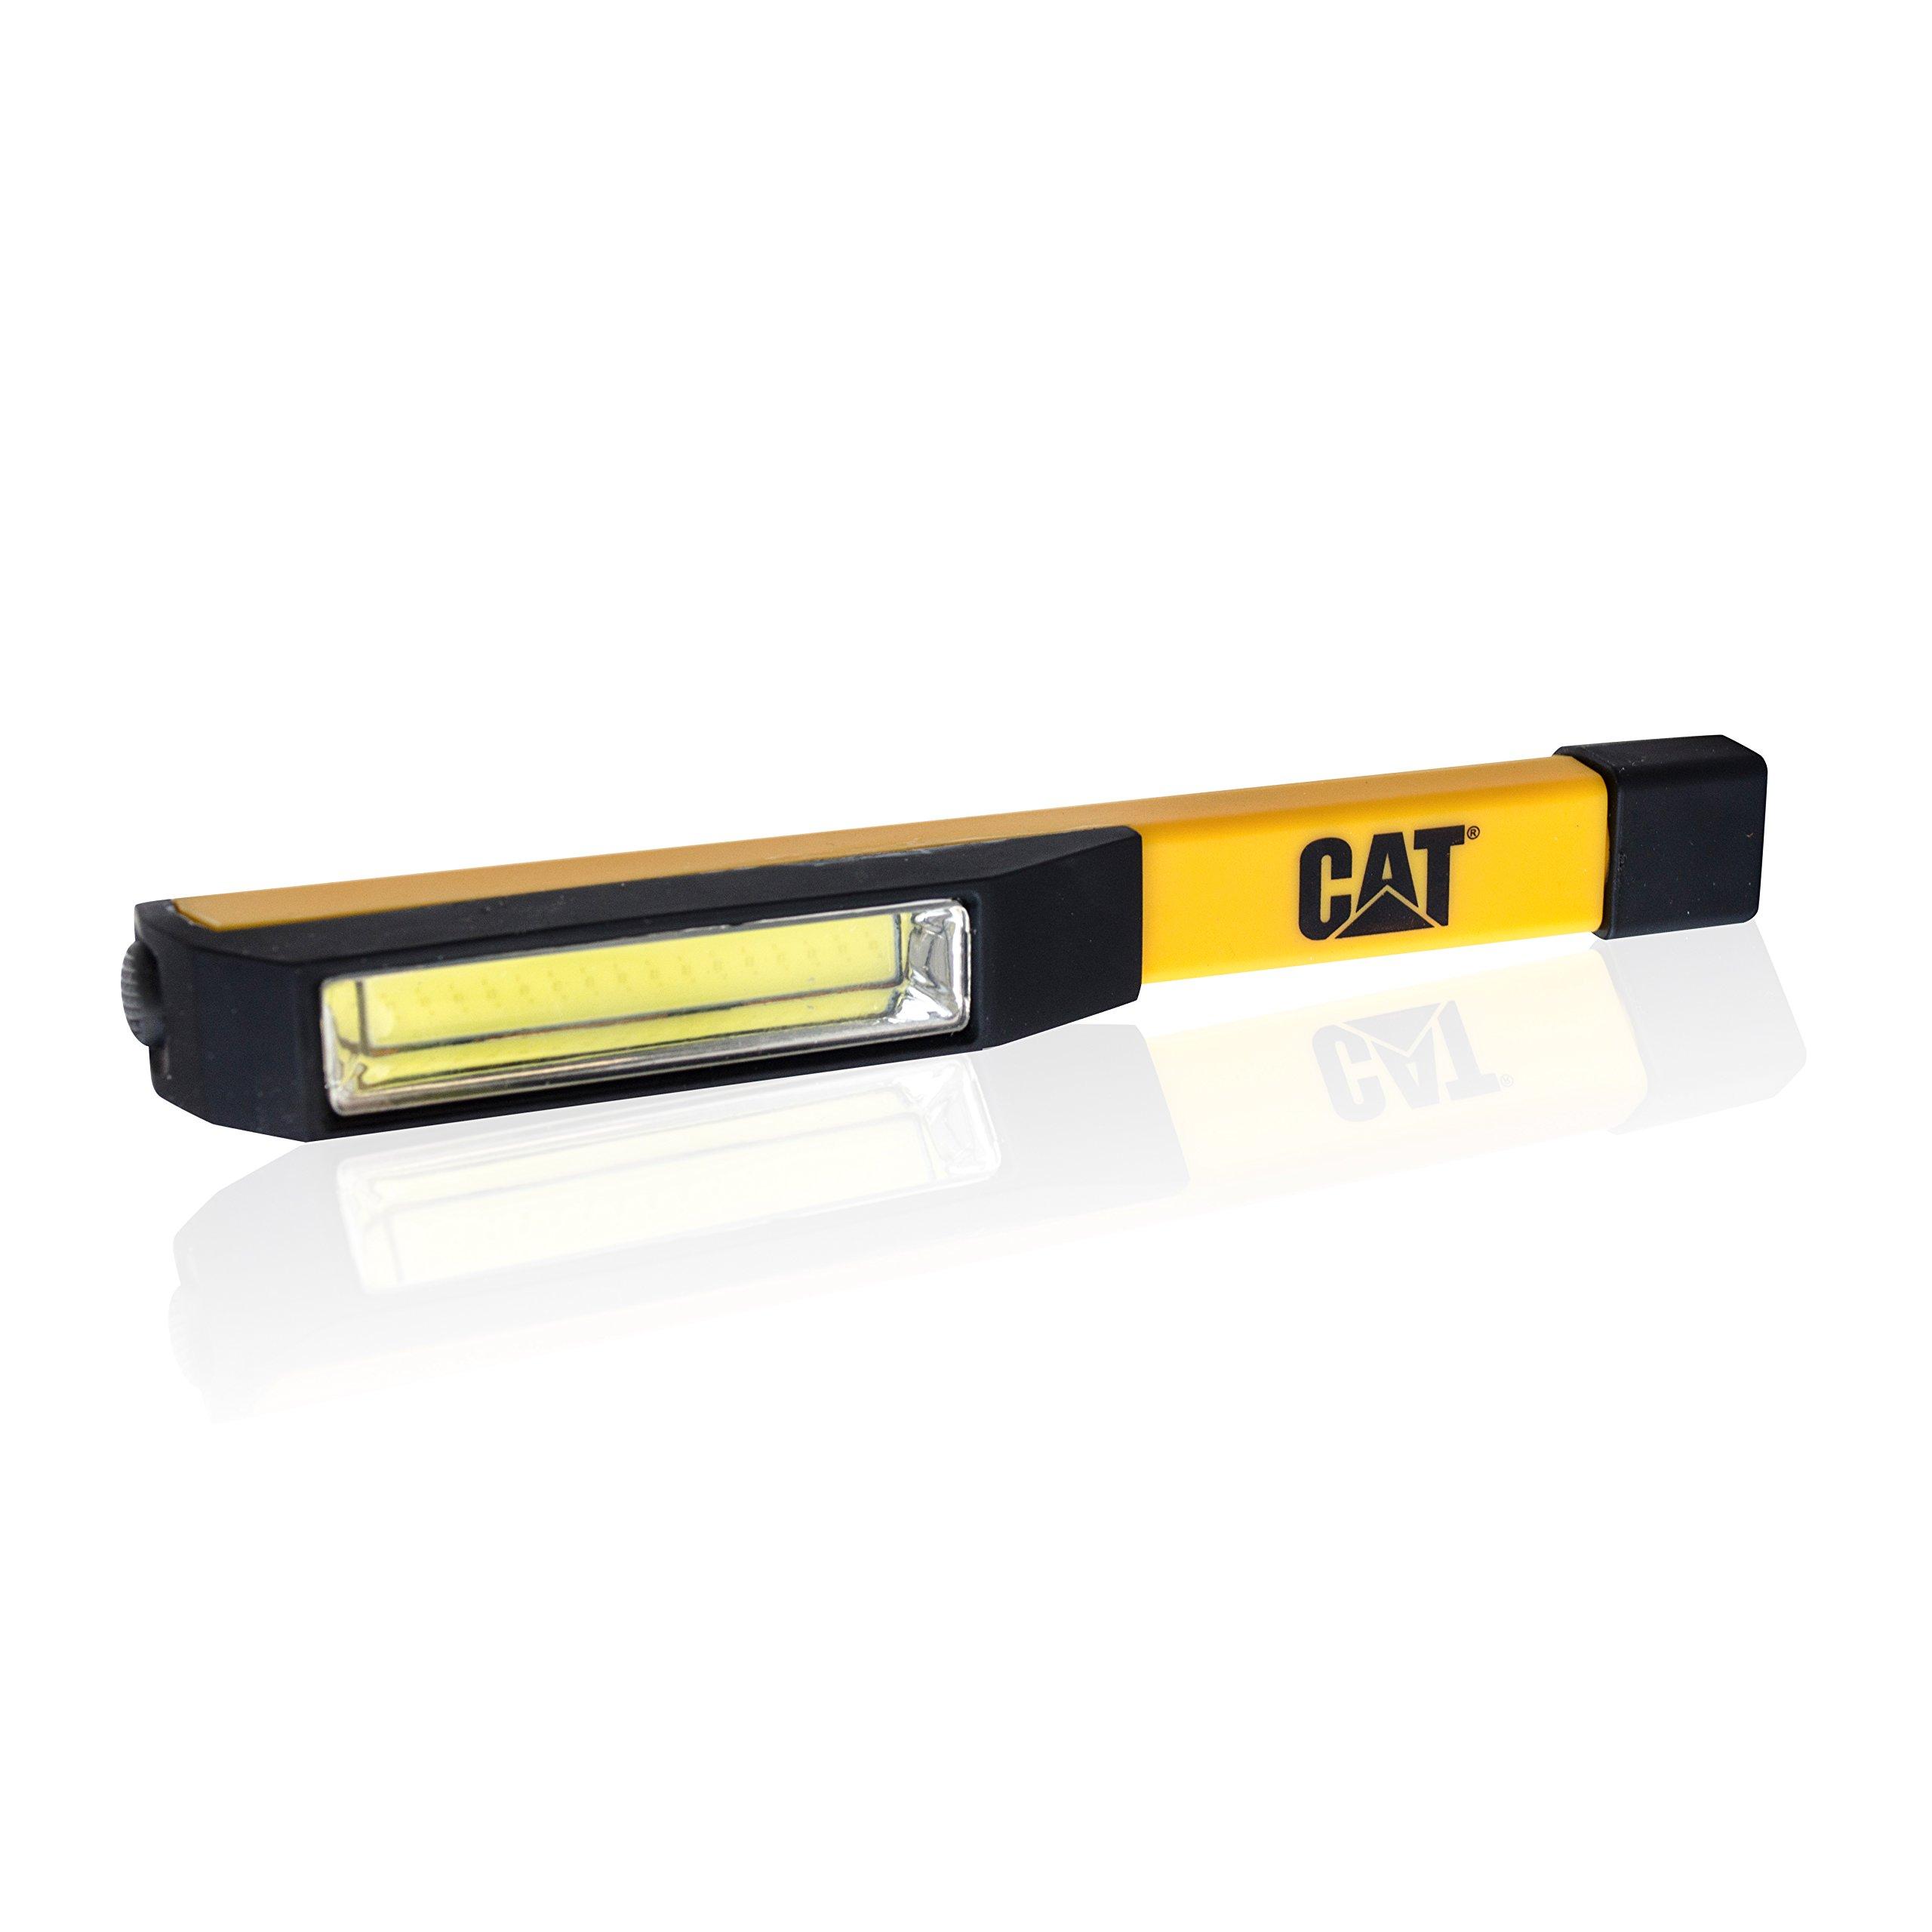 Cat CT1000 Pocket COB Light – Brilliantly Bright 175 Lumen COB LED Flood Beam Pocket Work Light, Black/Yellow